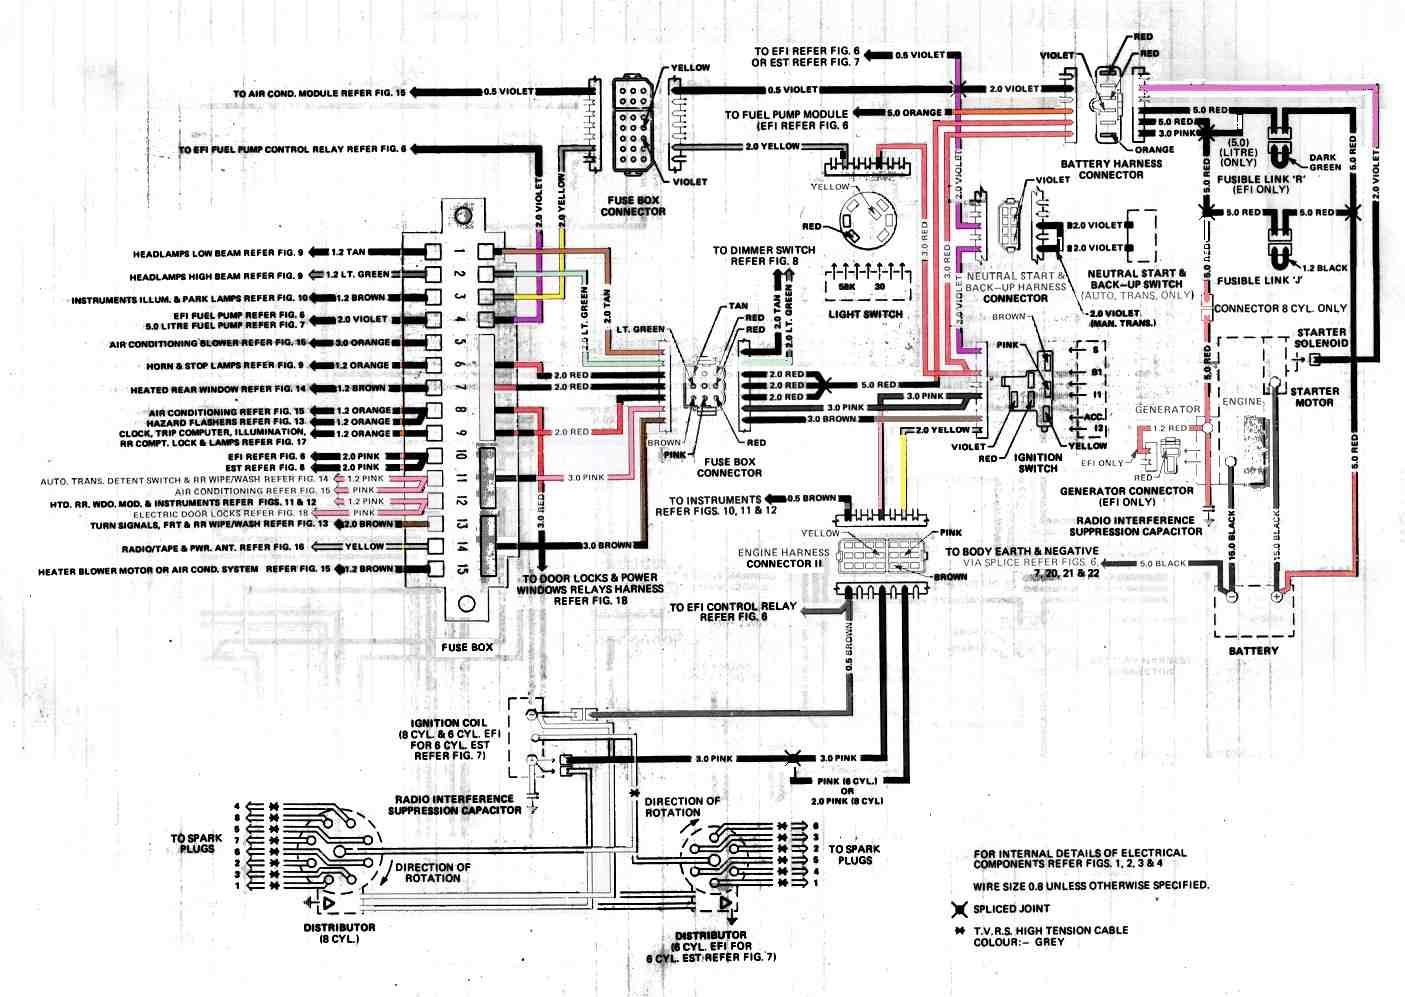 onan 4000 generator wiring diagram wiring solutions  remarkable onan emerald 1 wiring diagram gallery best image